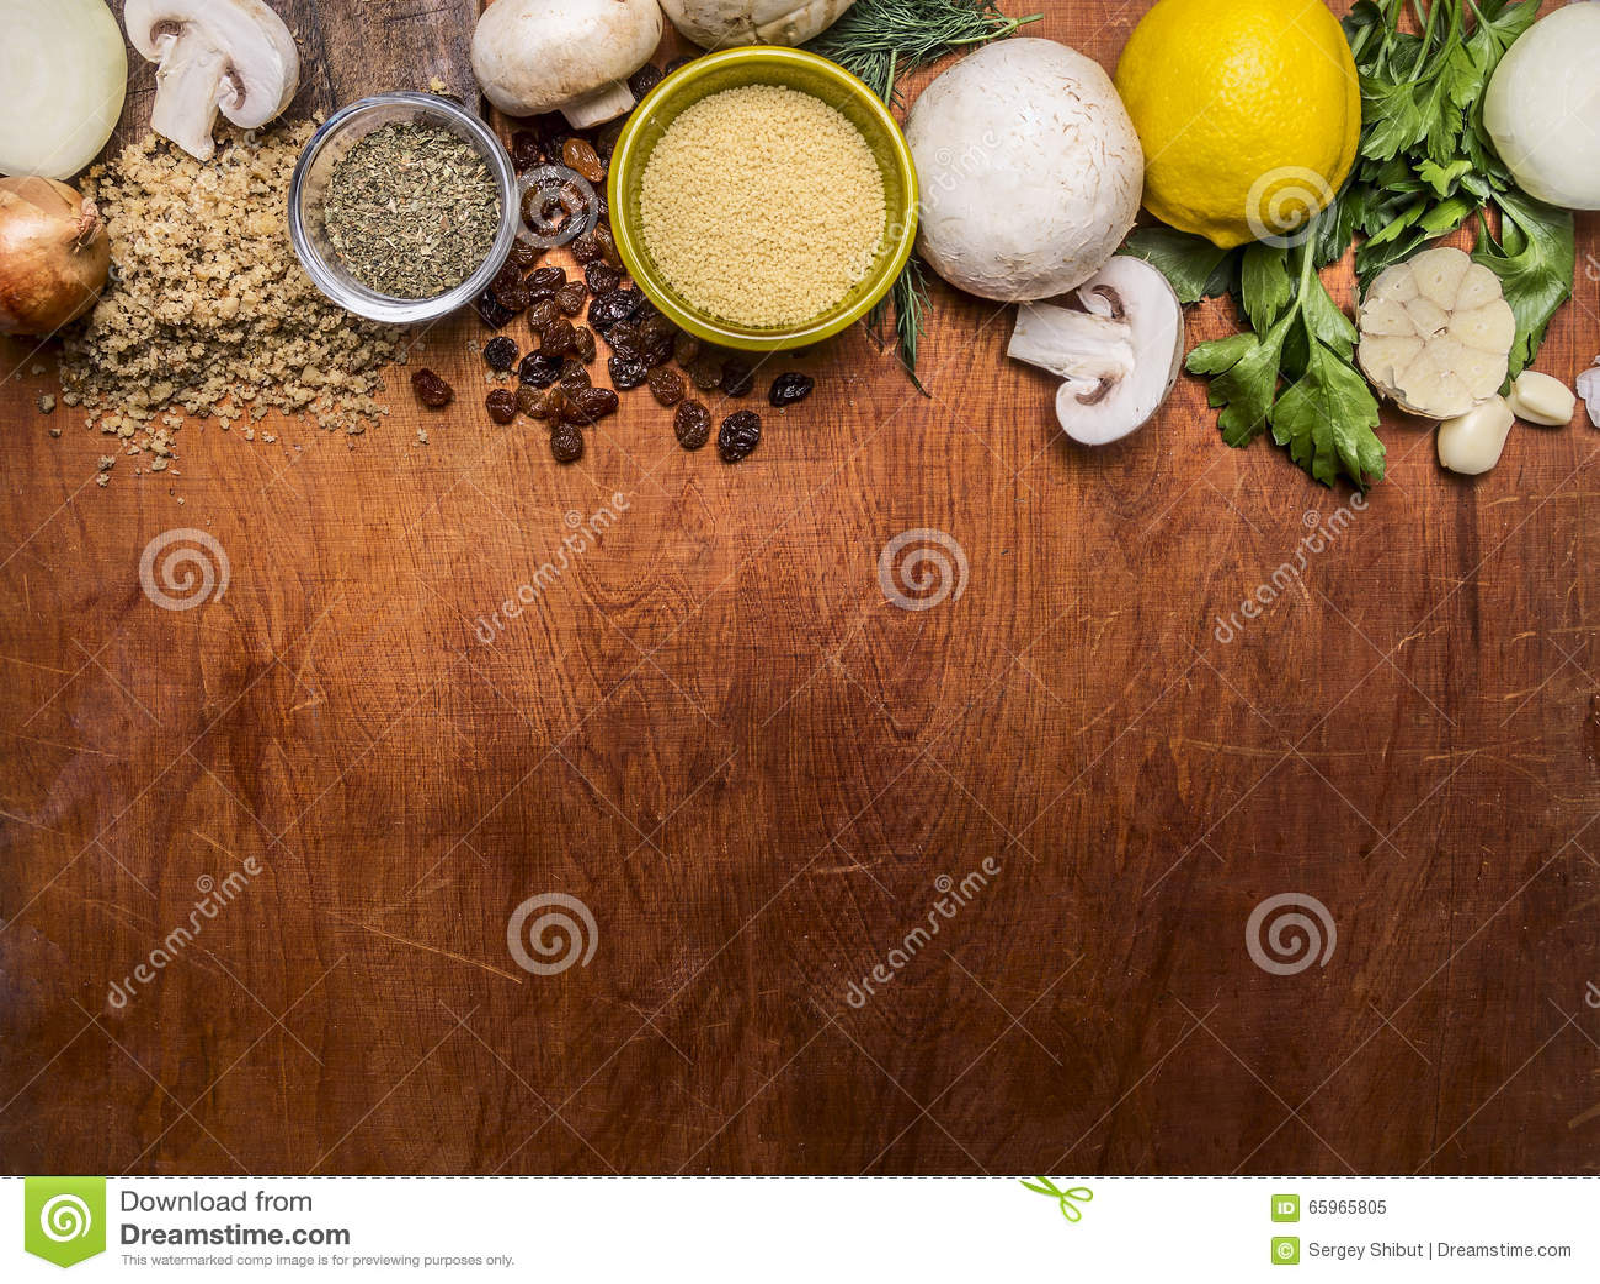 Vegetarian Food Pounded Walnuts, Lemon, Mushrooms ...